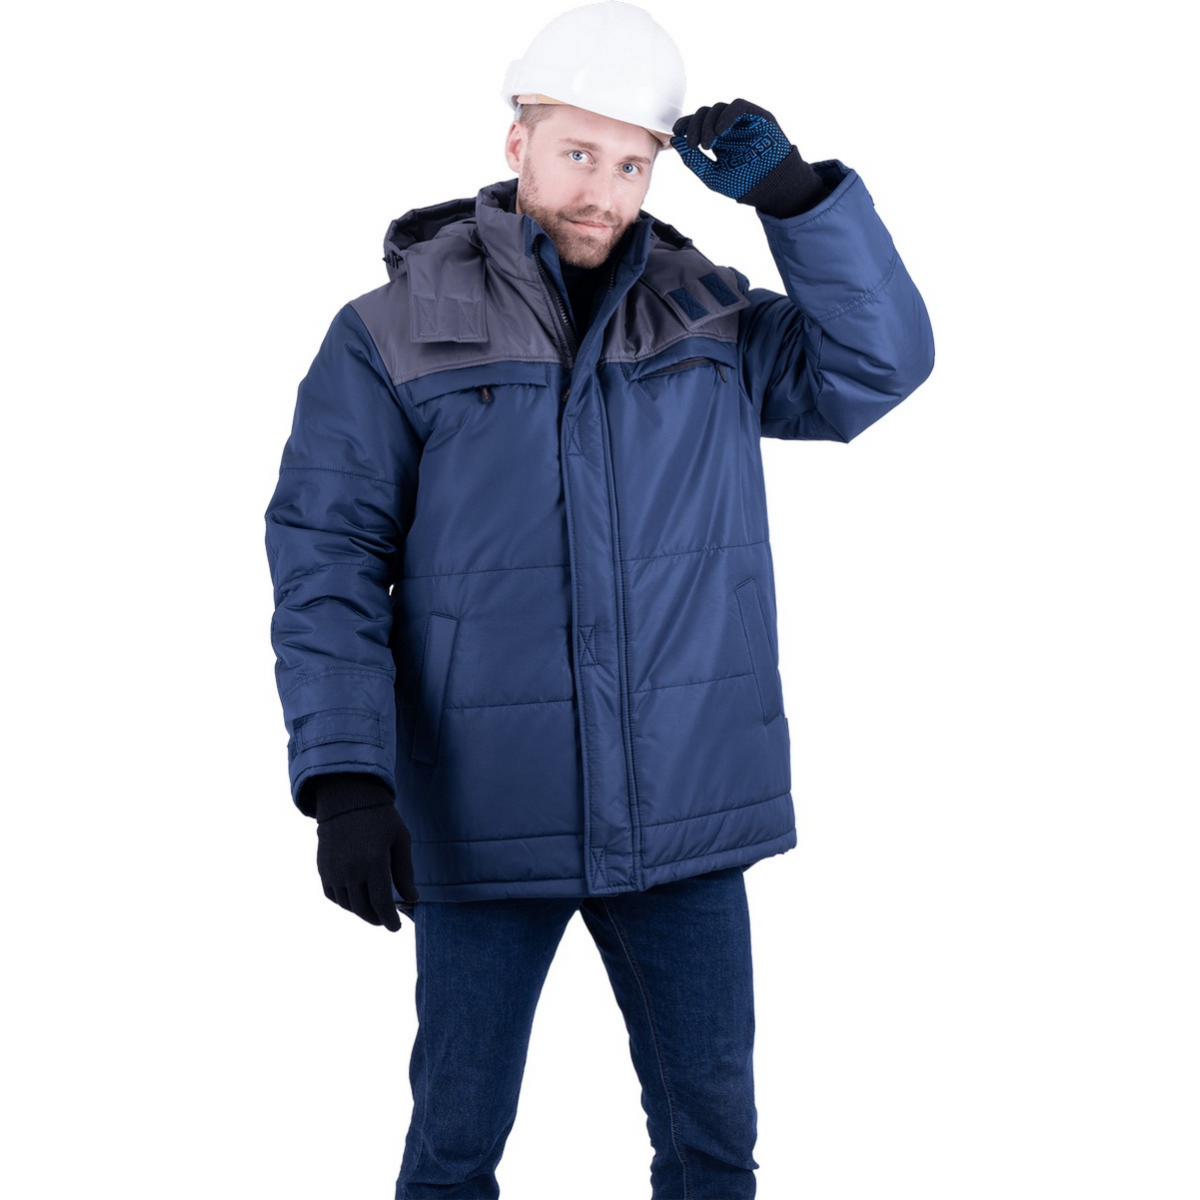 Куртка ШАТЛ утепленная  т/синий-серый (разм. 112-116 рост 170-176)